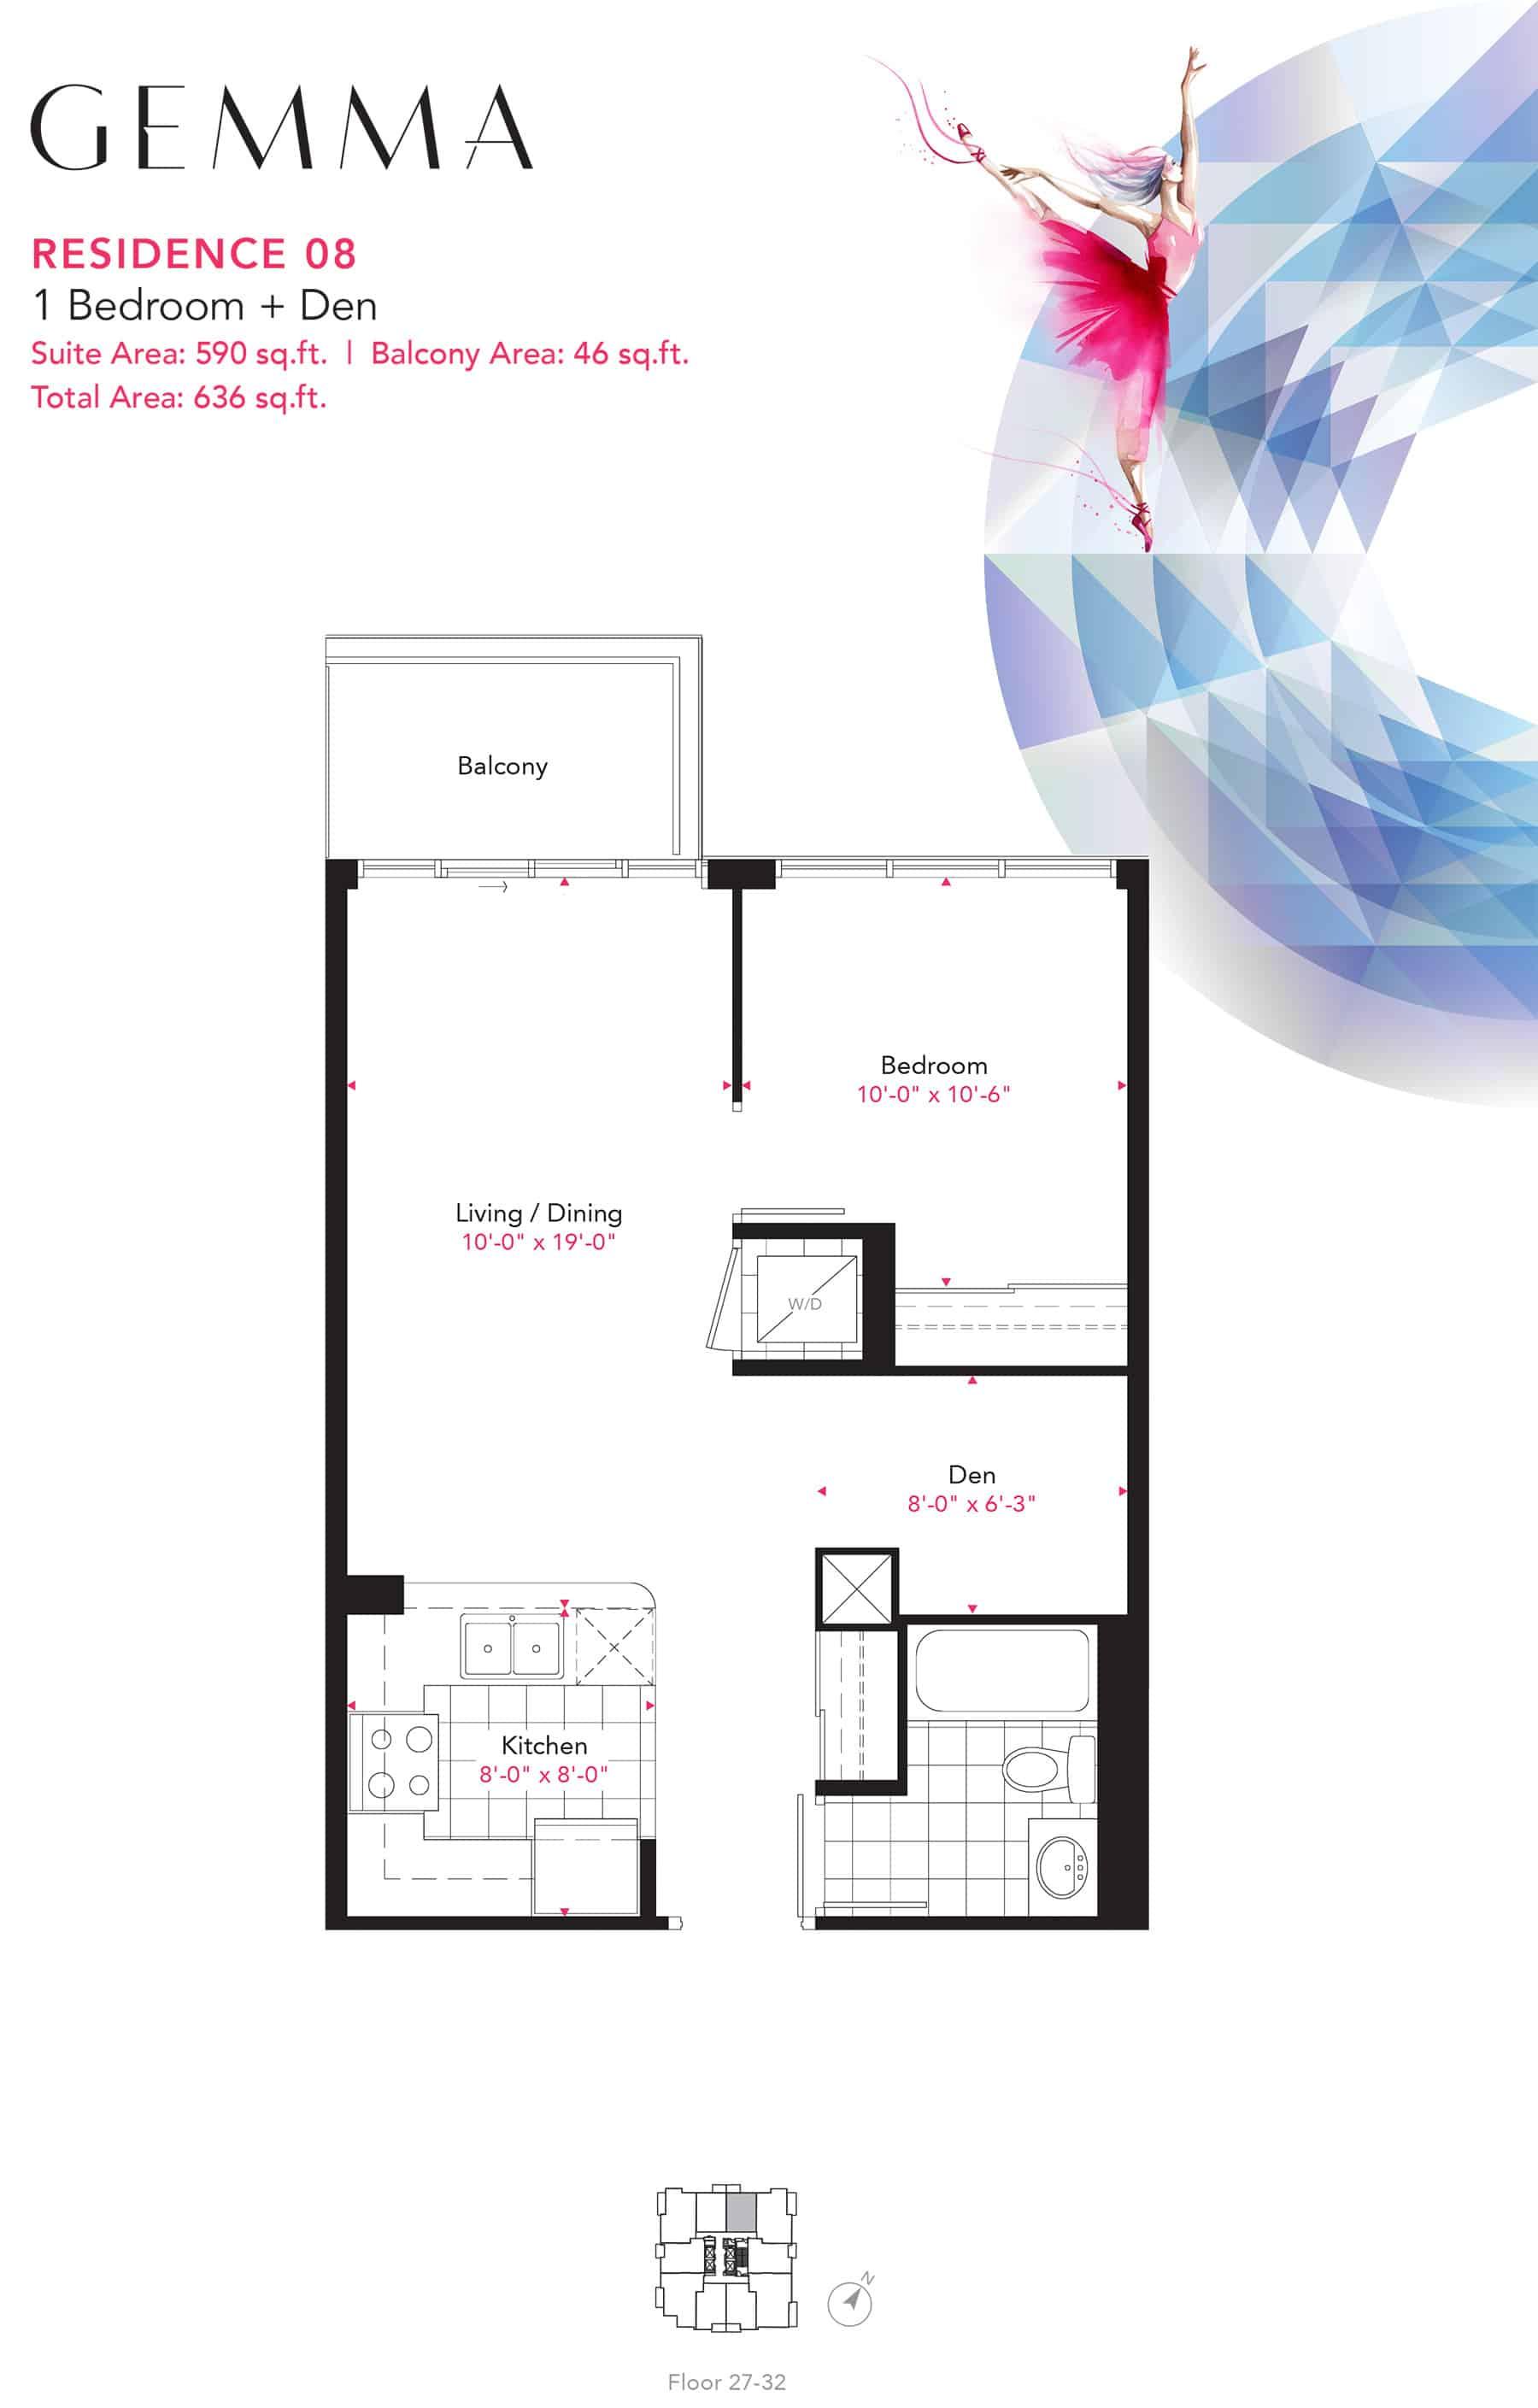 Residence-08-1B+D-590-Sqft-Gemma  Gemma Condos Residence 08 1BD 590 Sqft Gemma